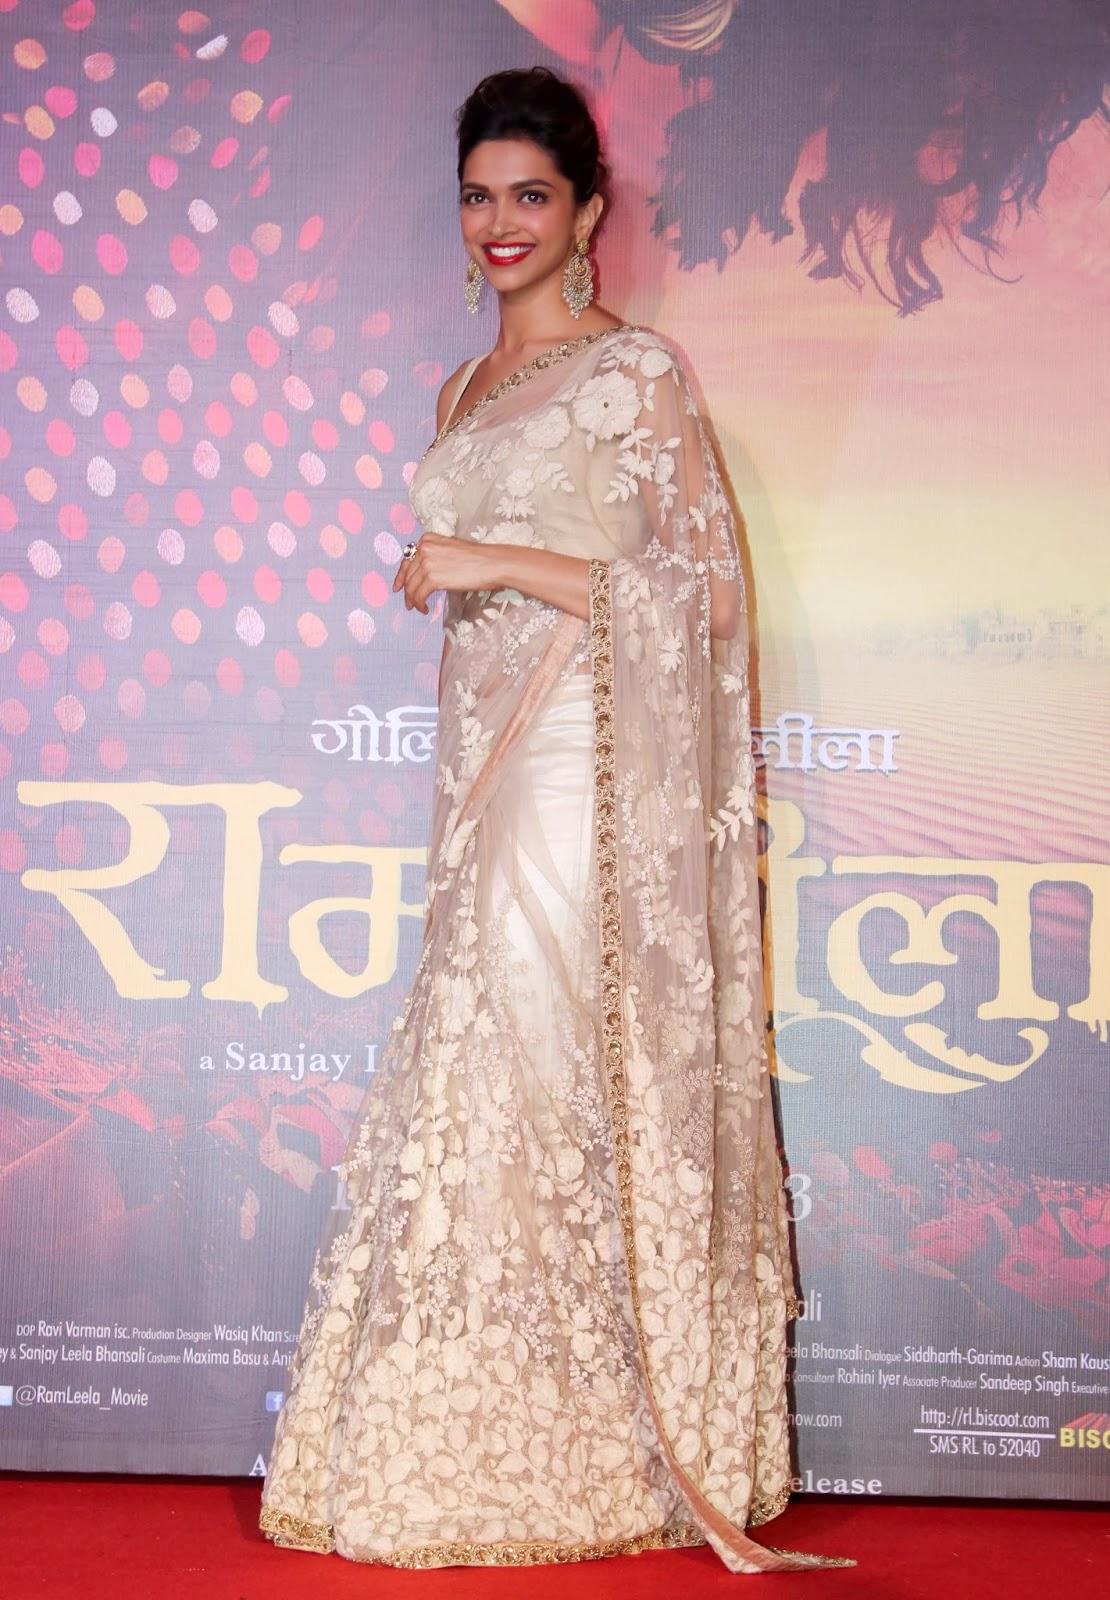 Free Download Hd Wallpapers Deepika Padukone In Beautiful